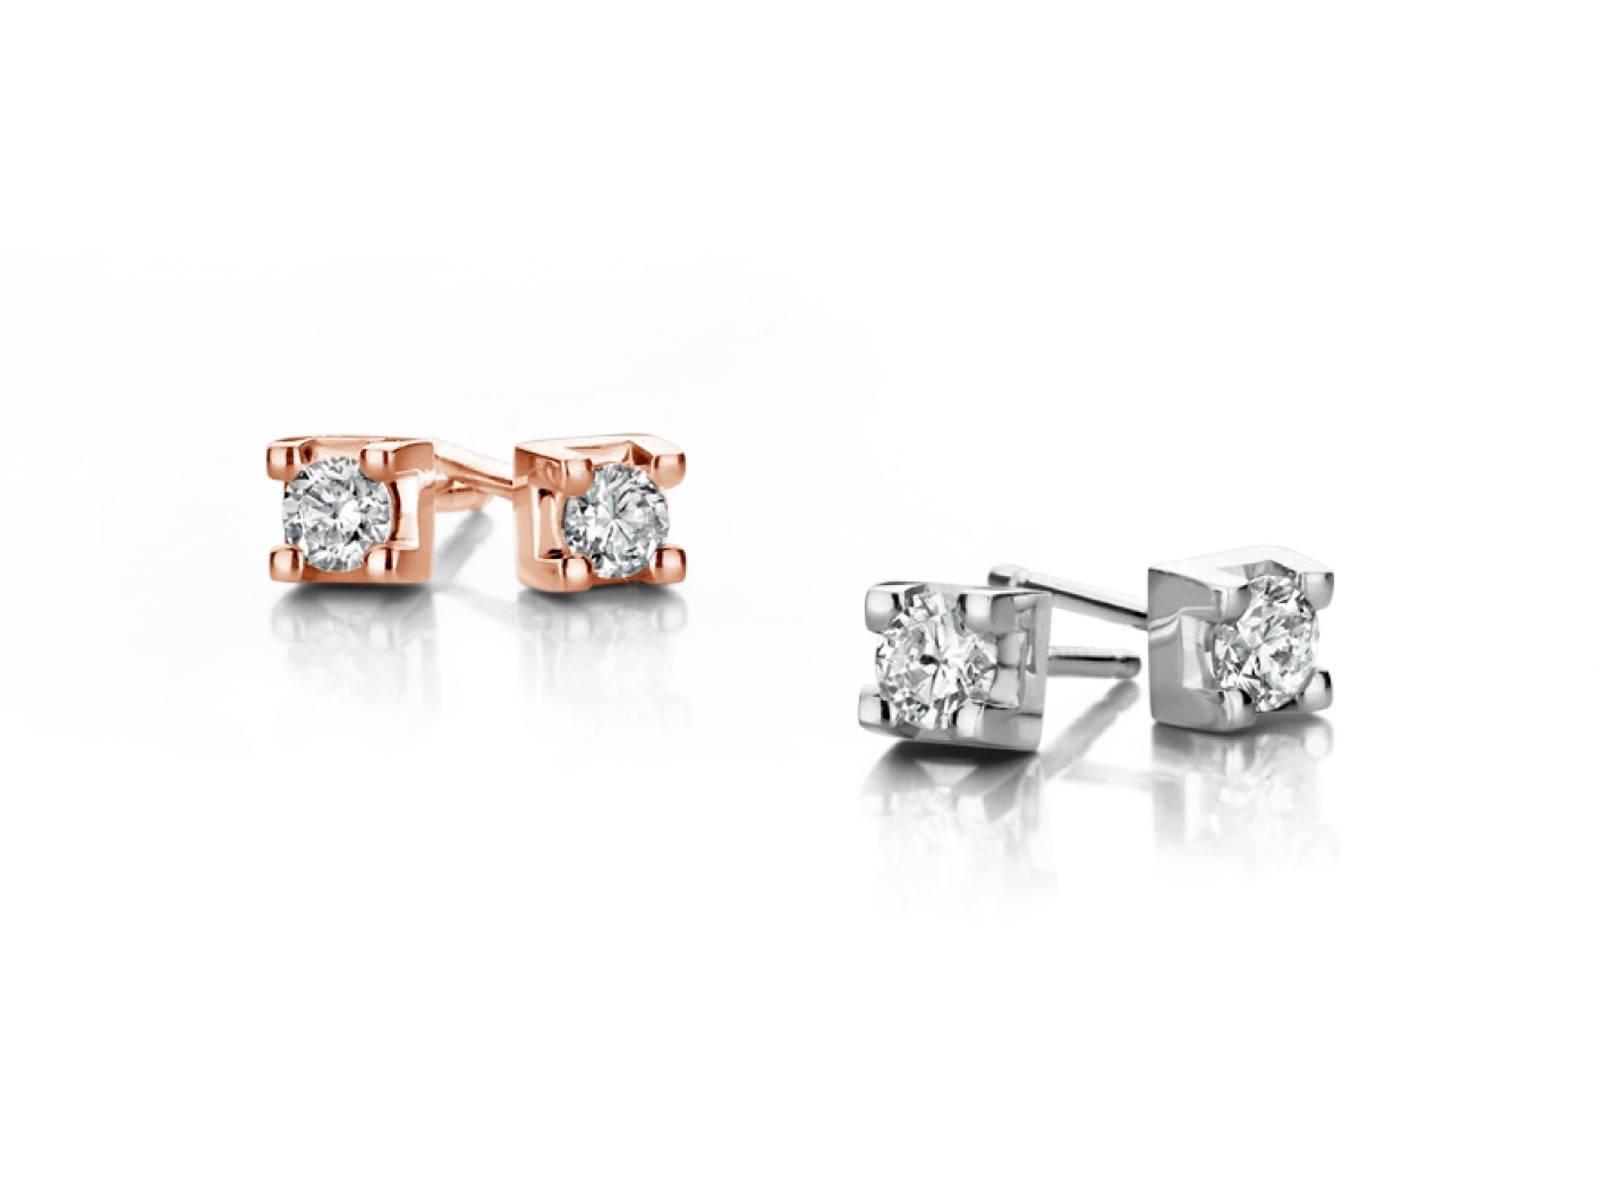 Juwelier Jan Maes - Trouwringen - Verlovingsringen - Juwelen - House of Weddings - 28